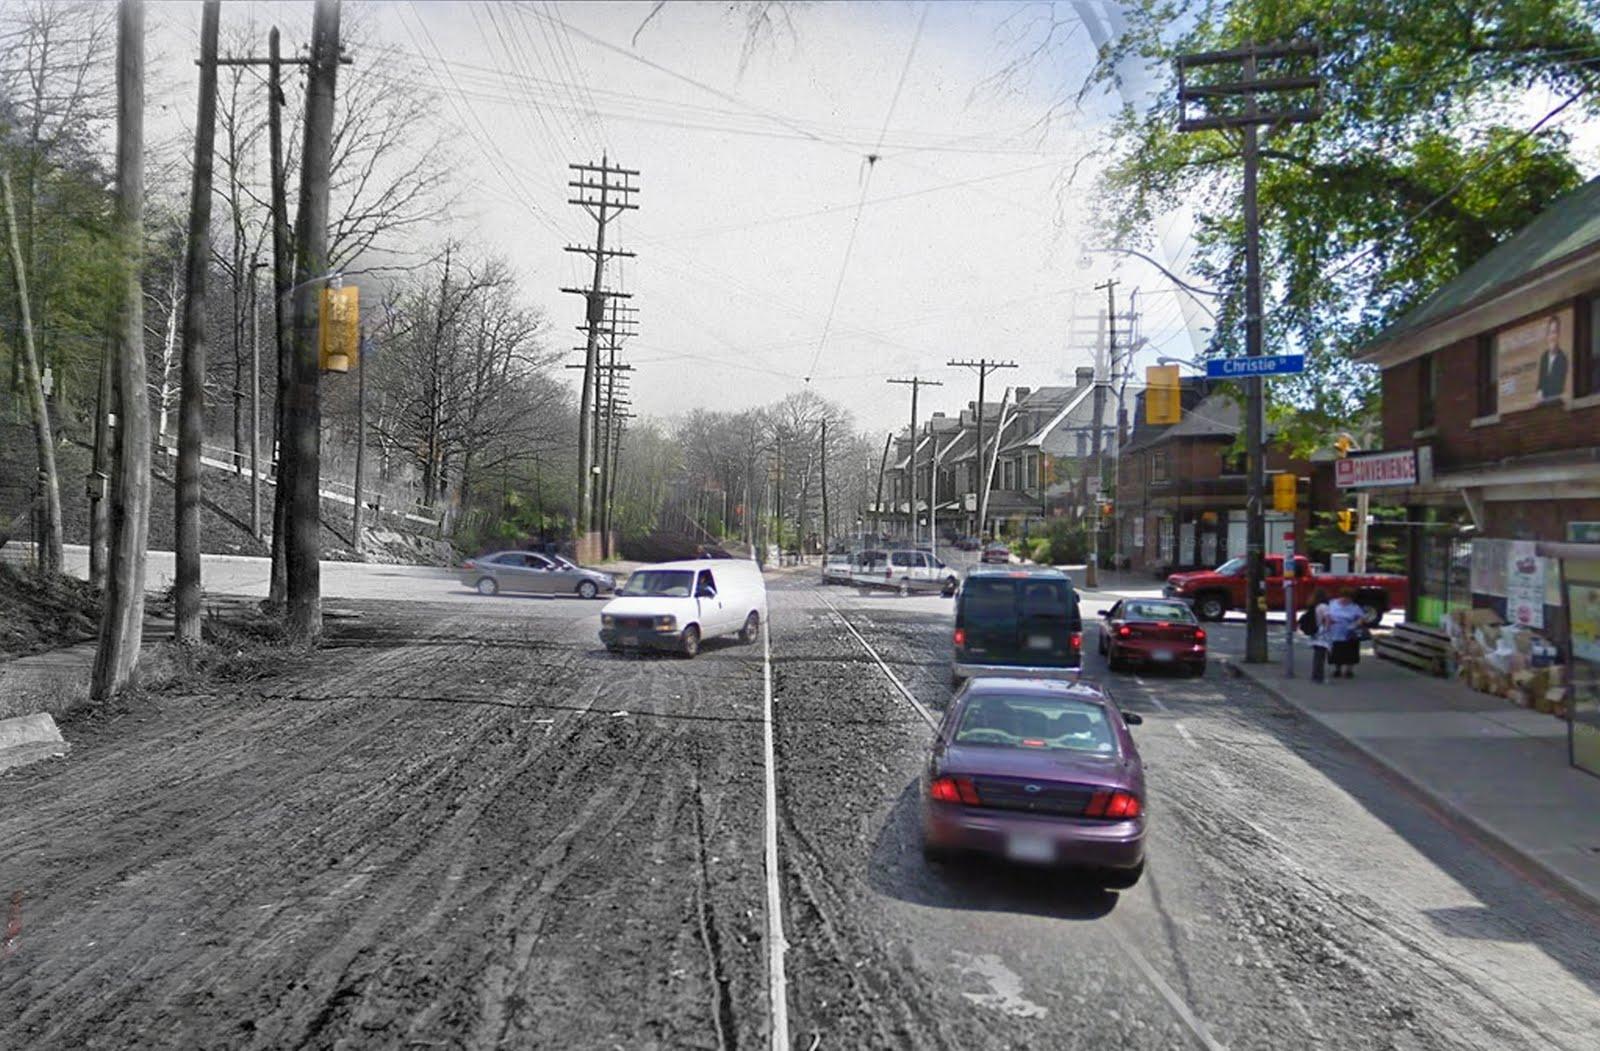 Dupont Toronto Davenport Mature Escort